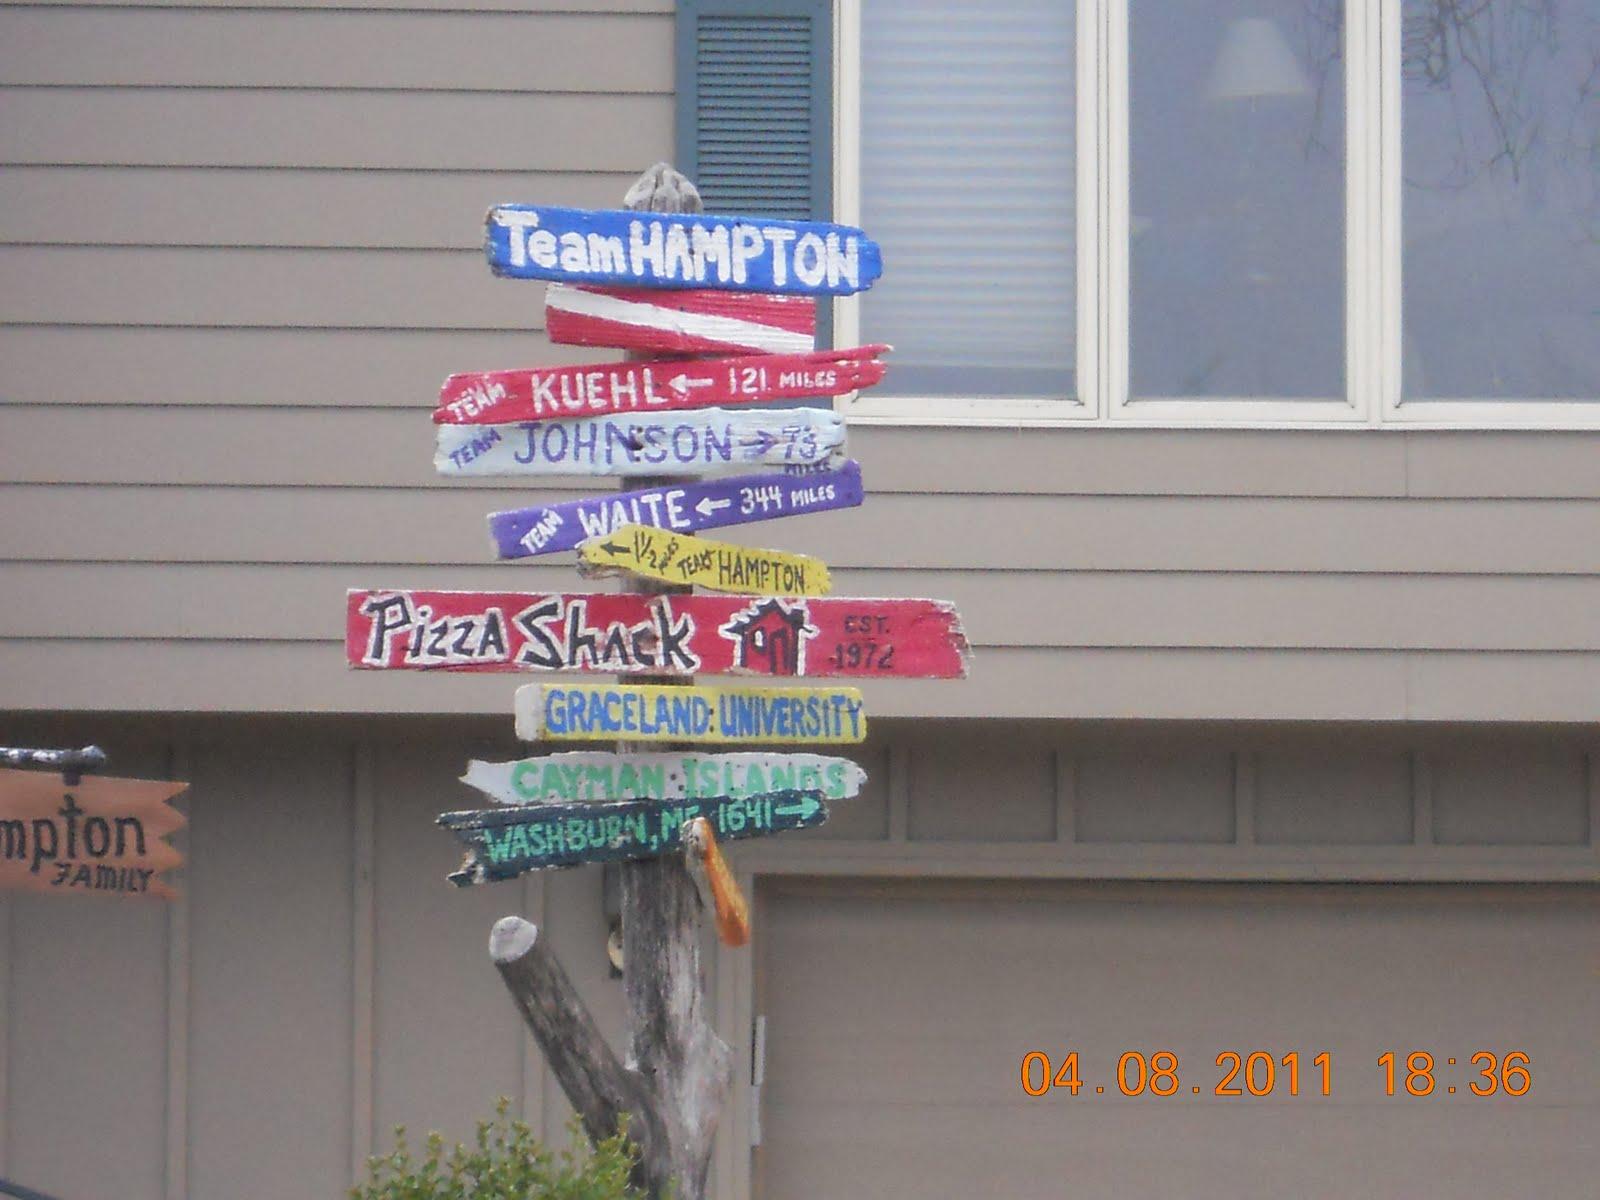 Whimsical Cottage Lamoni, Iowa Sightings